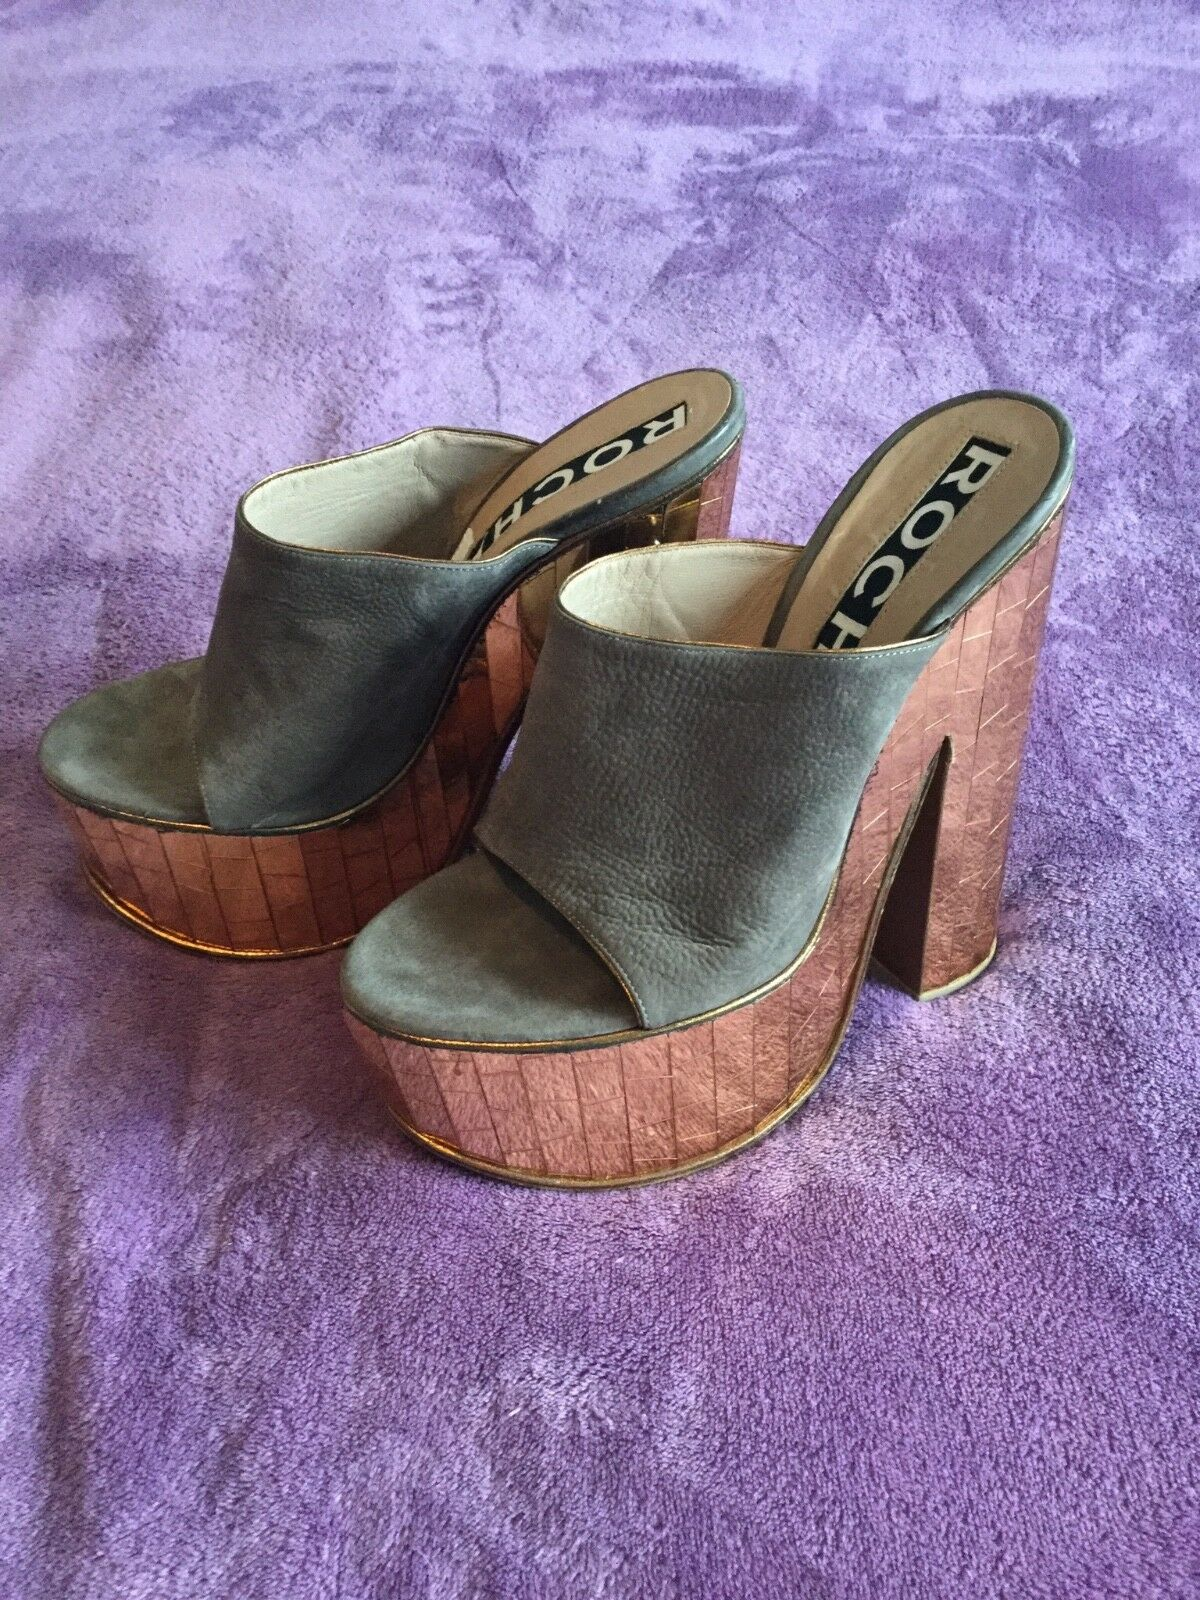 Waw show stopper ROCHAS Designer mirroROT heel mule  sandles Uk 6